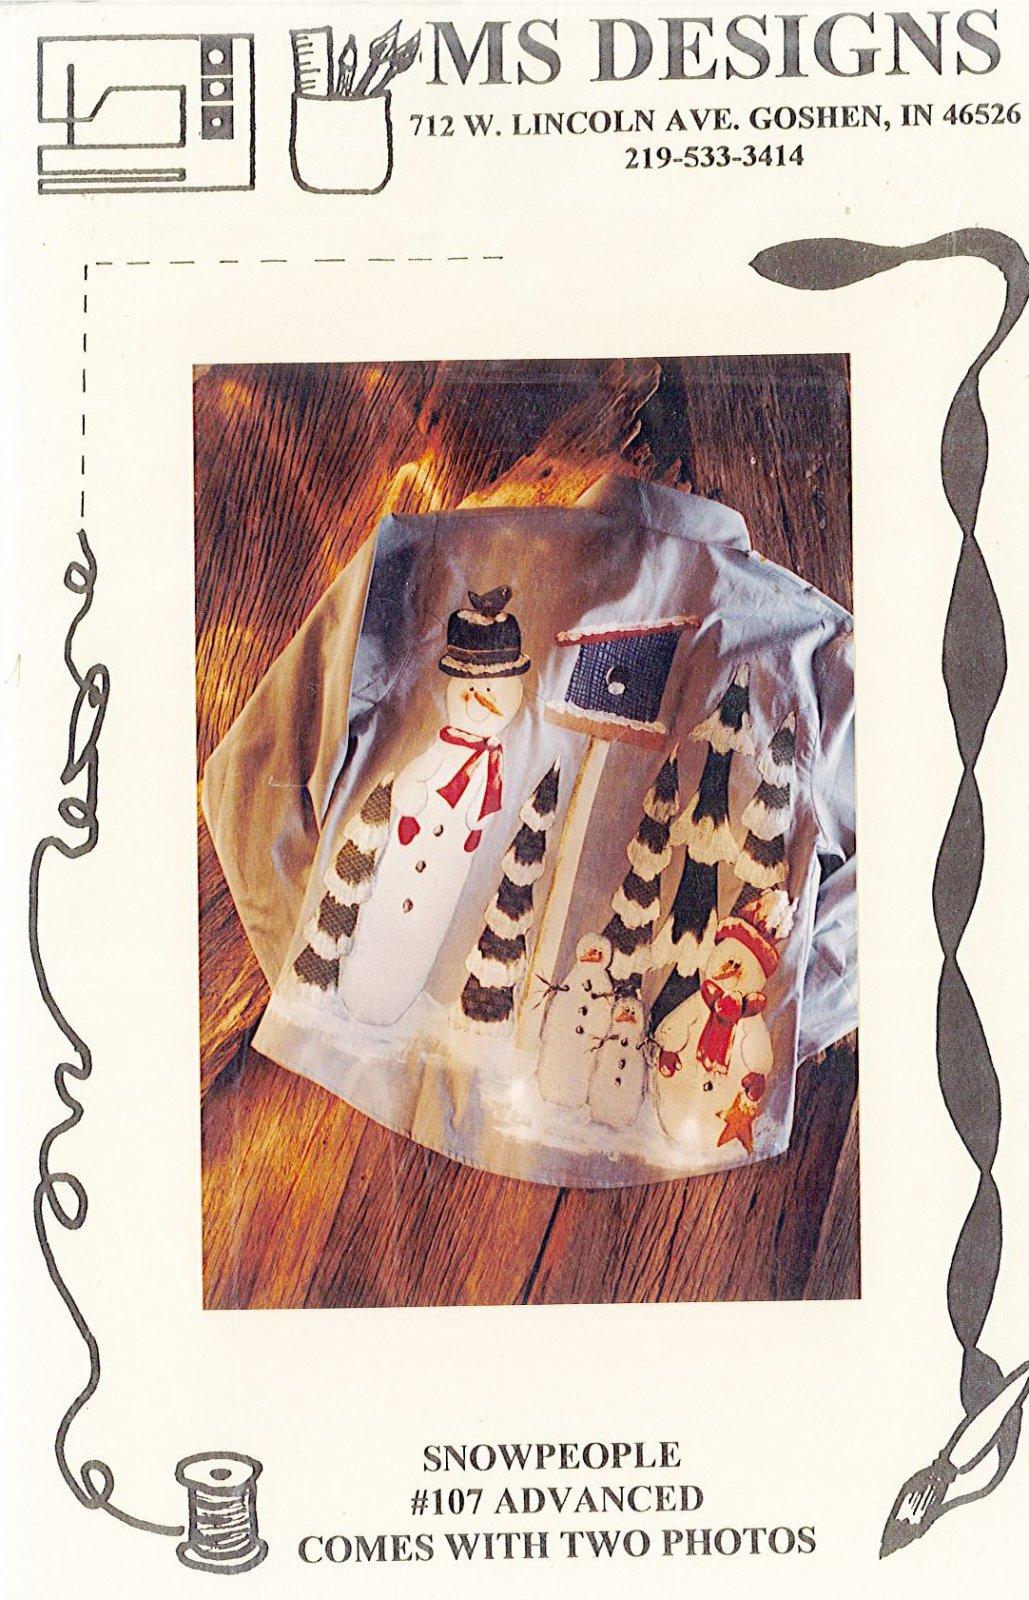 MS DESIGNS - Snowpeople #107